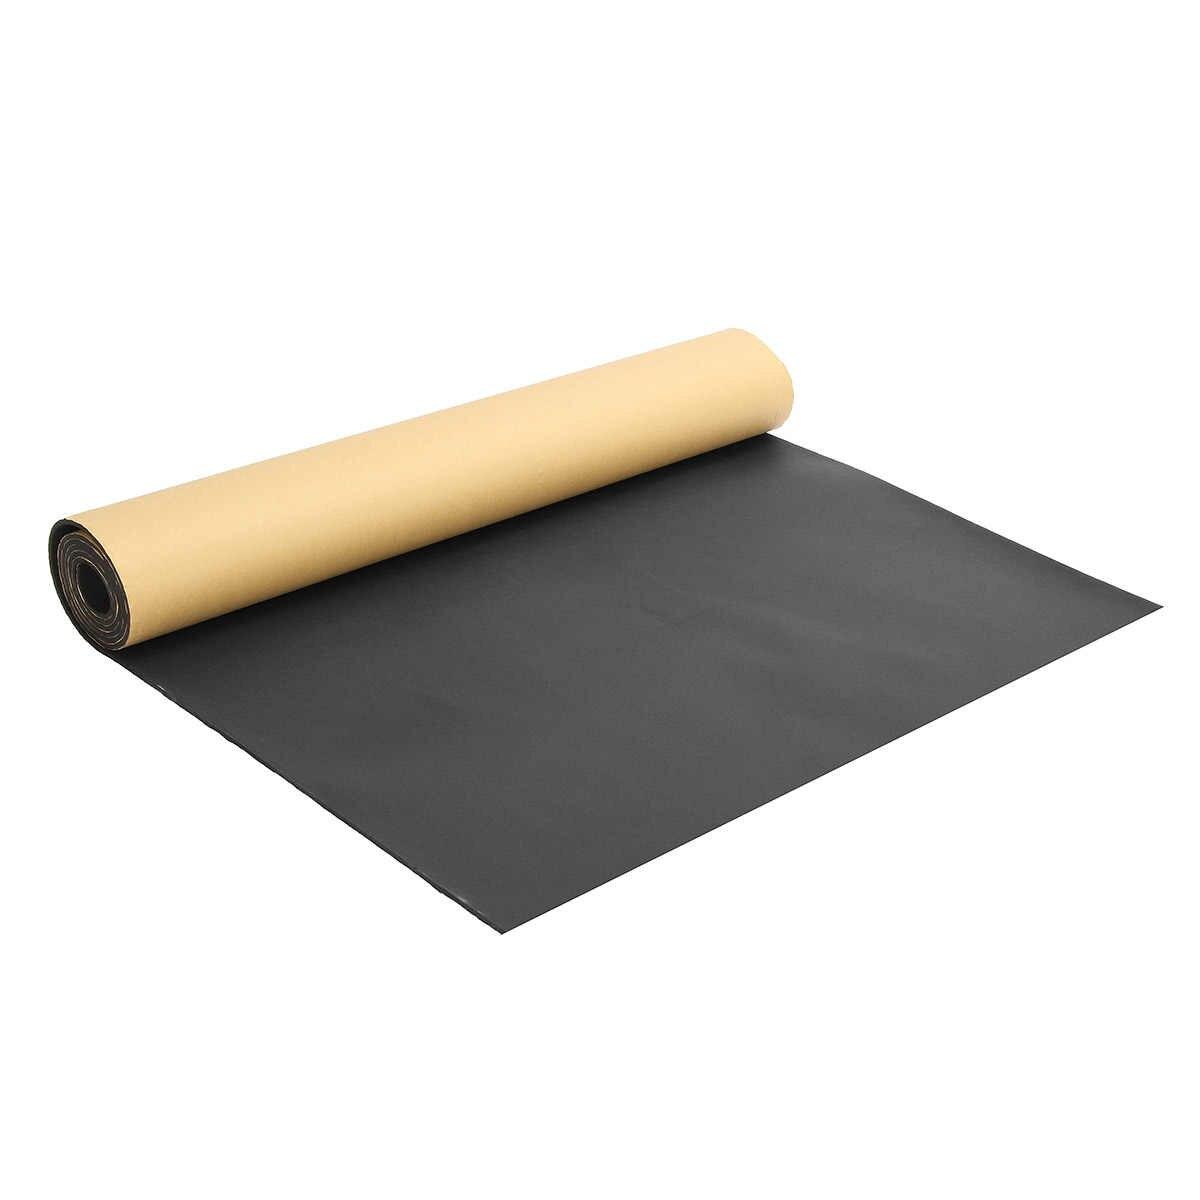 300x100cm Car Auto Sound Deadening Cotton Automobiles Sound-Proof Heat  Insulation Pad Foam Mat Carpets Interior Accessories